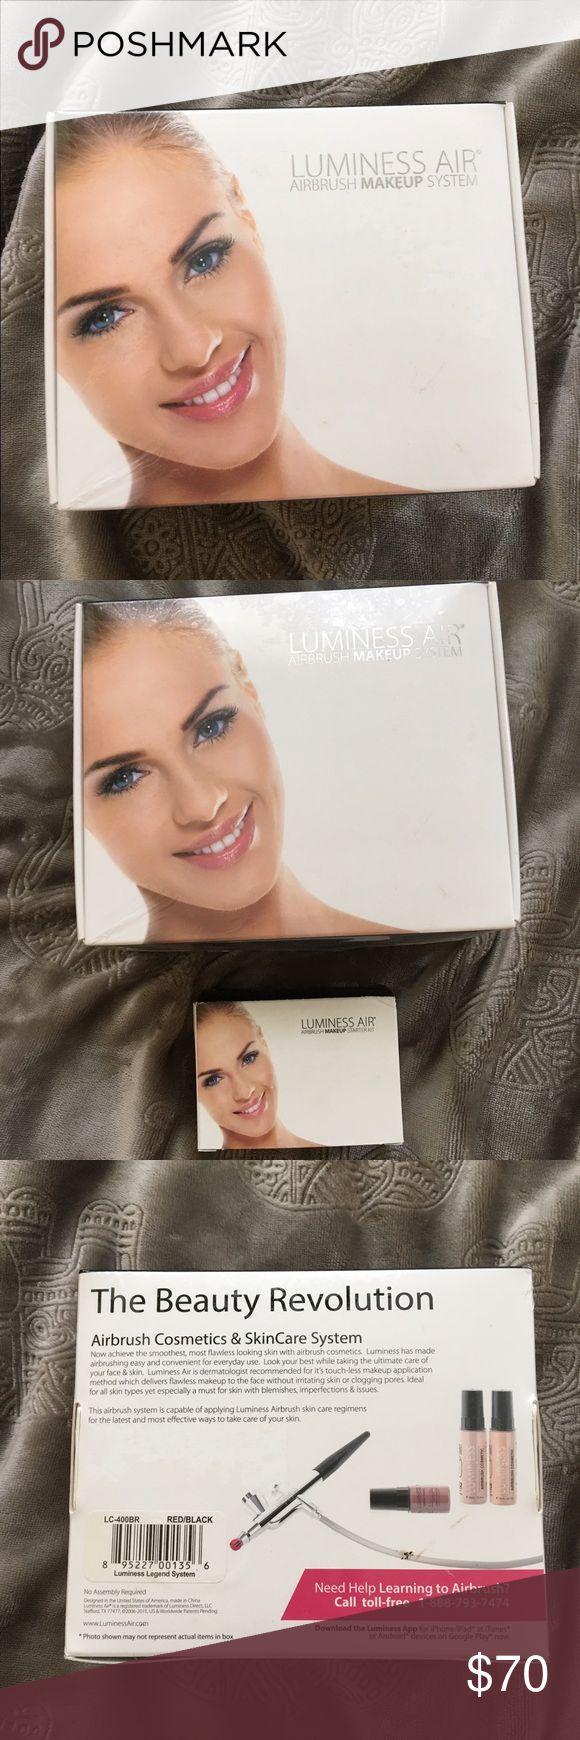 Lumpiness Air Airbrush Makeup System! Airbrush makeup system with makeup! Brand new! Makeup